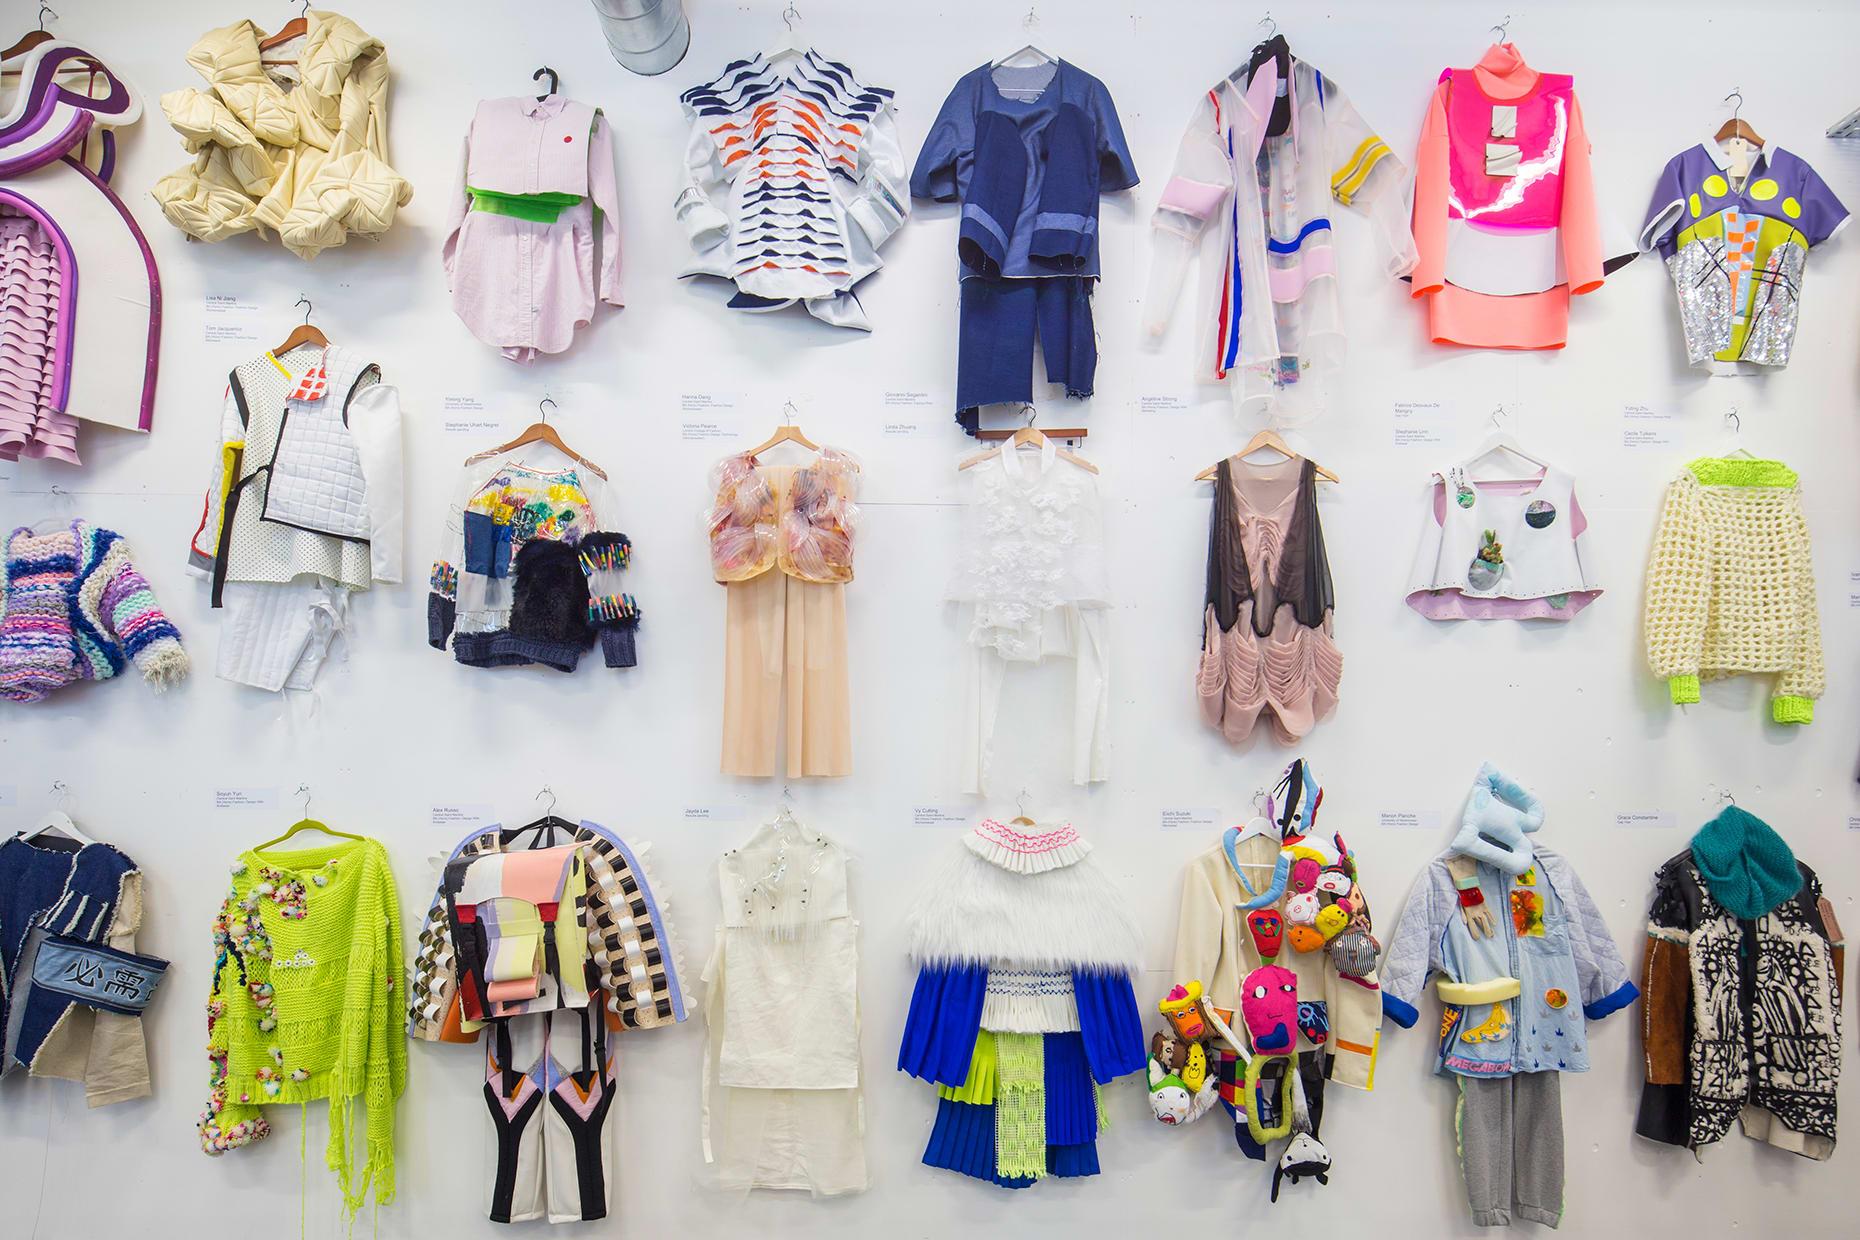 garment-wall.jpg